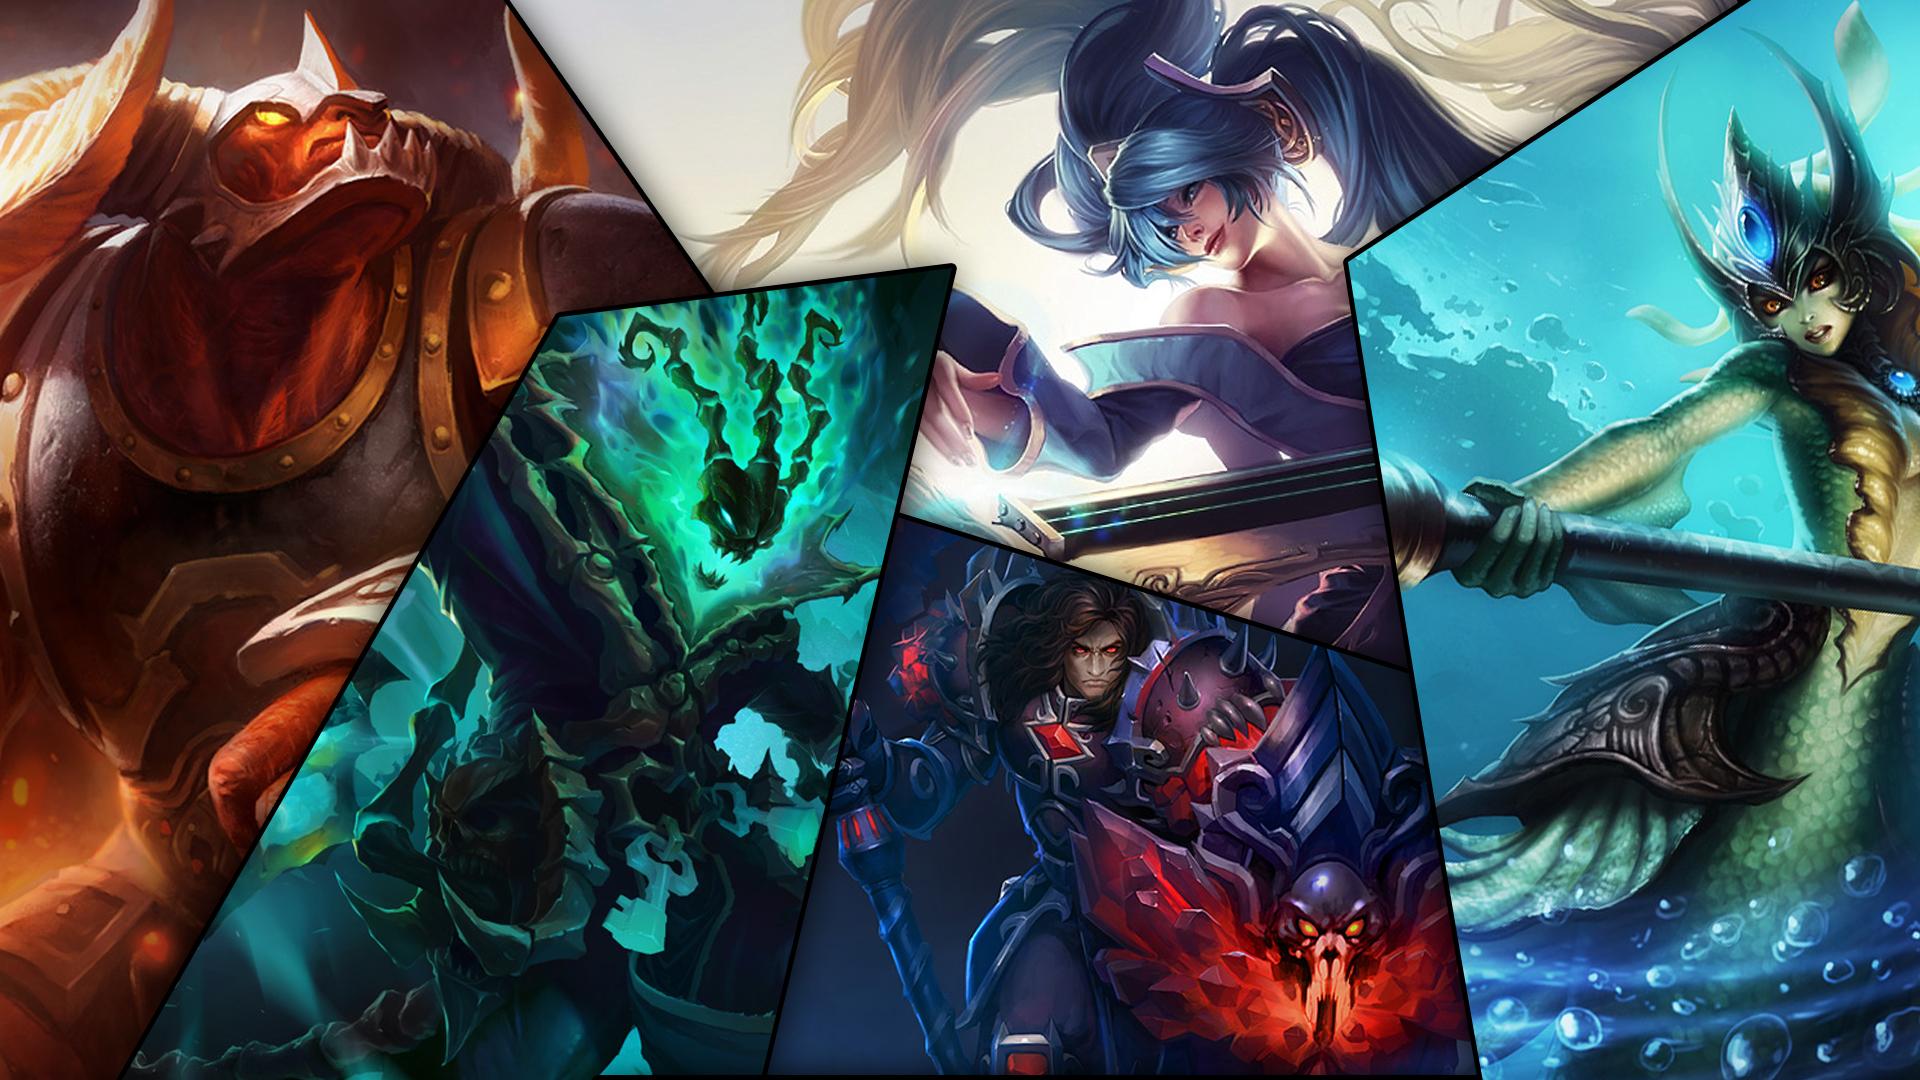 Collage League Of Legends Champions Wallpaper By Nibblesmekibbles